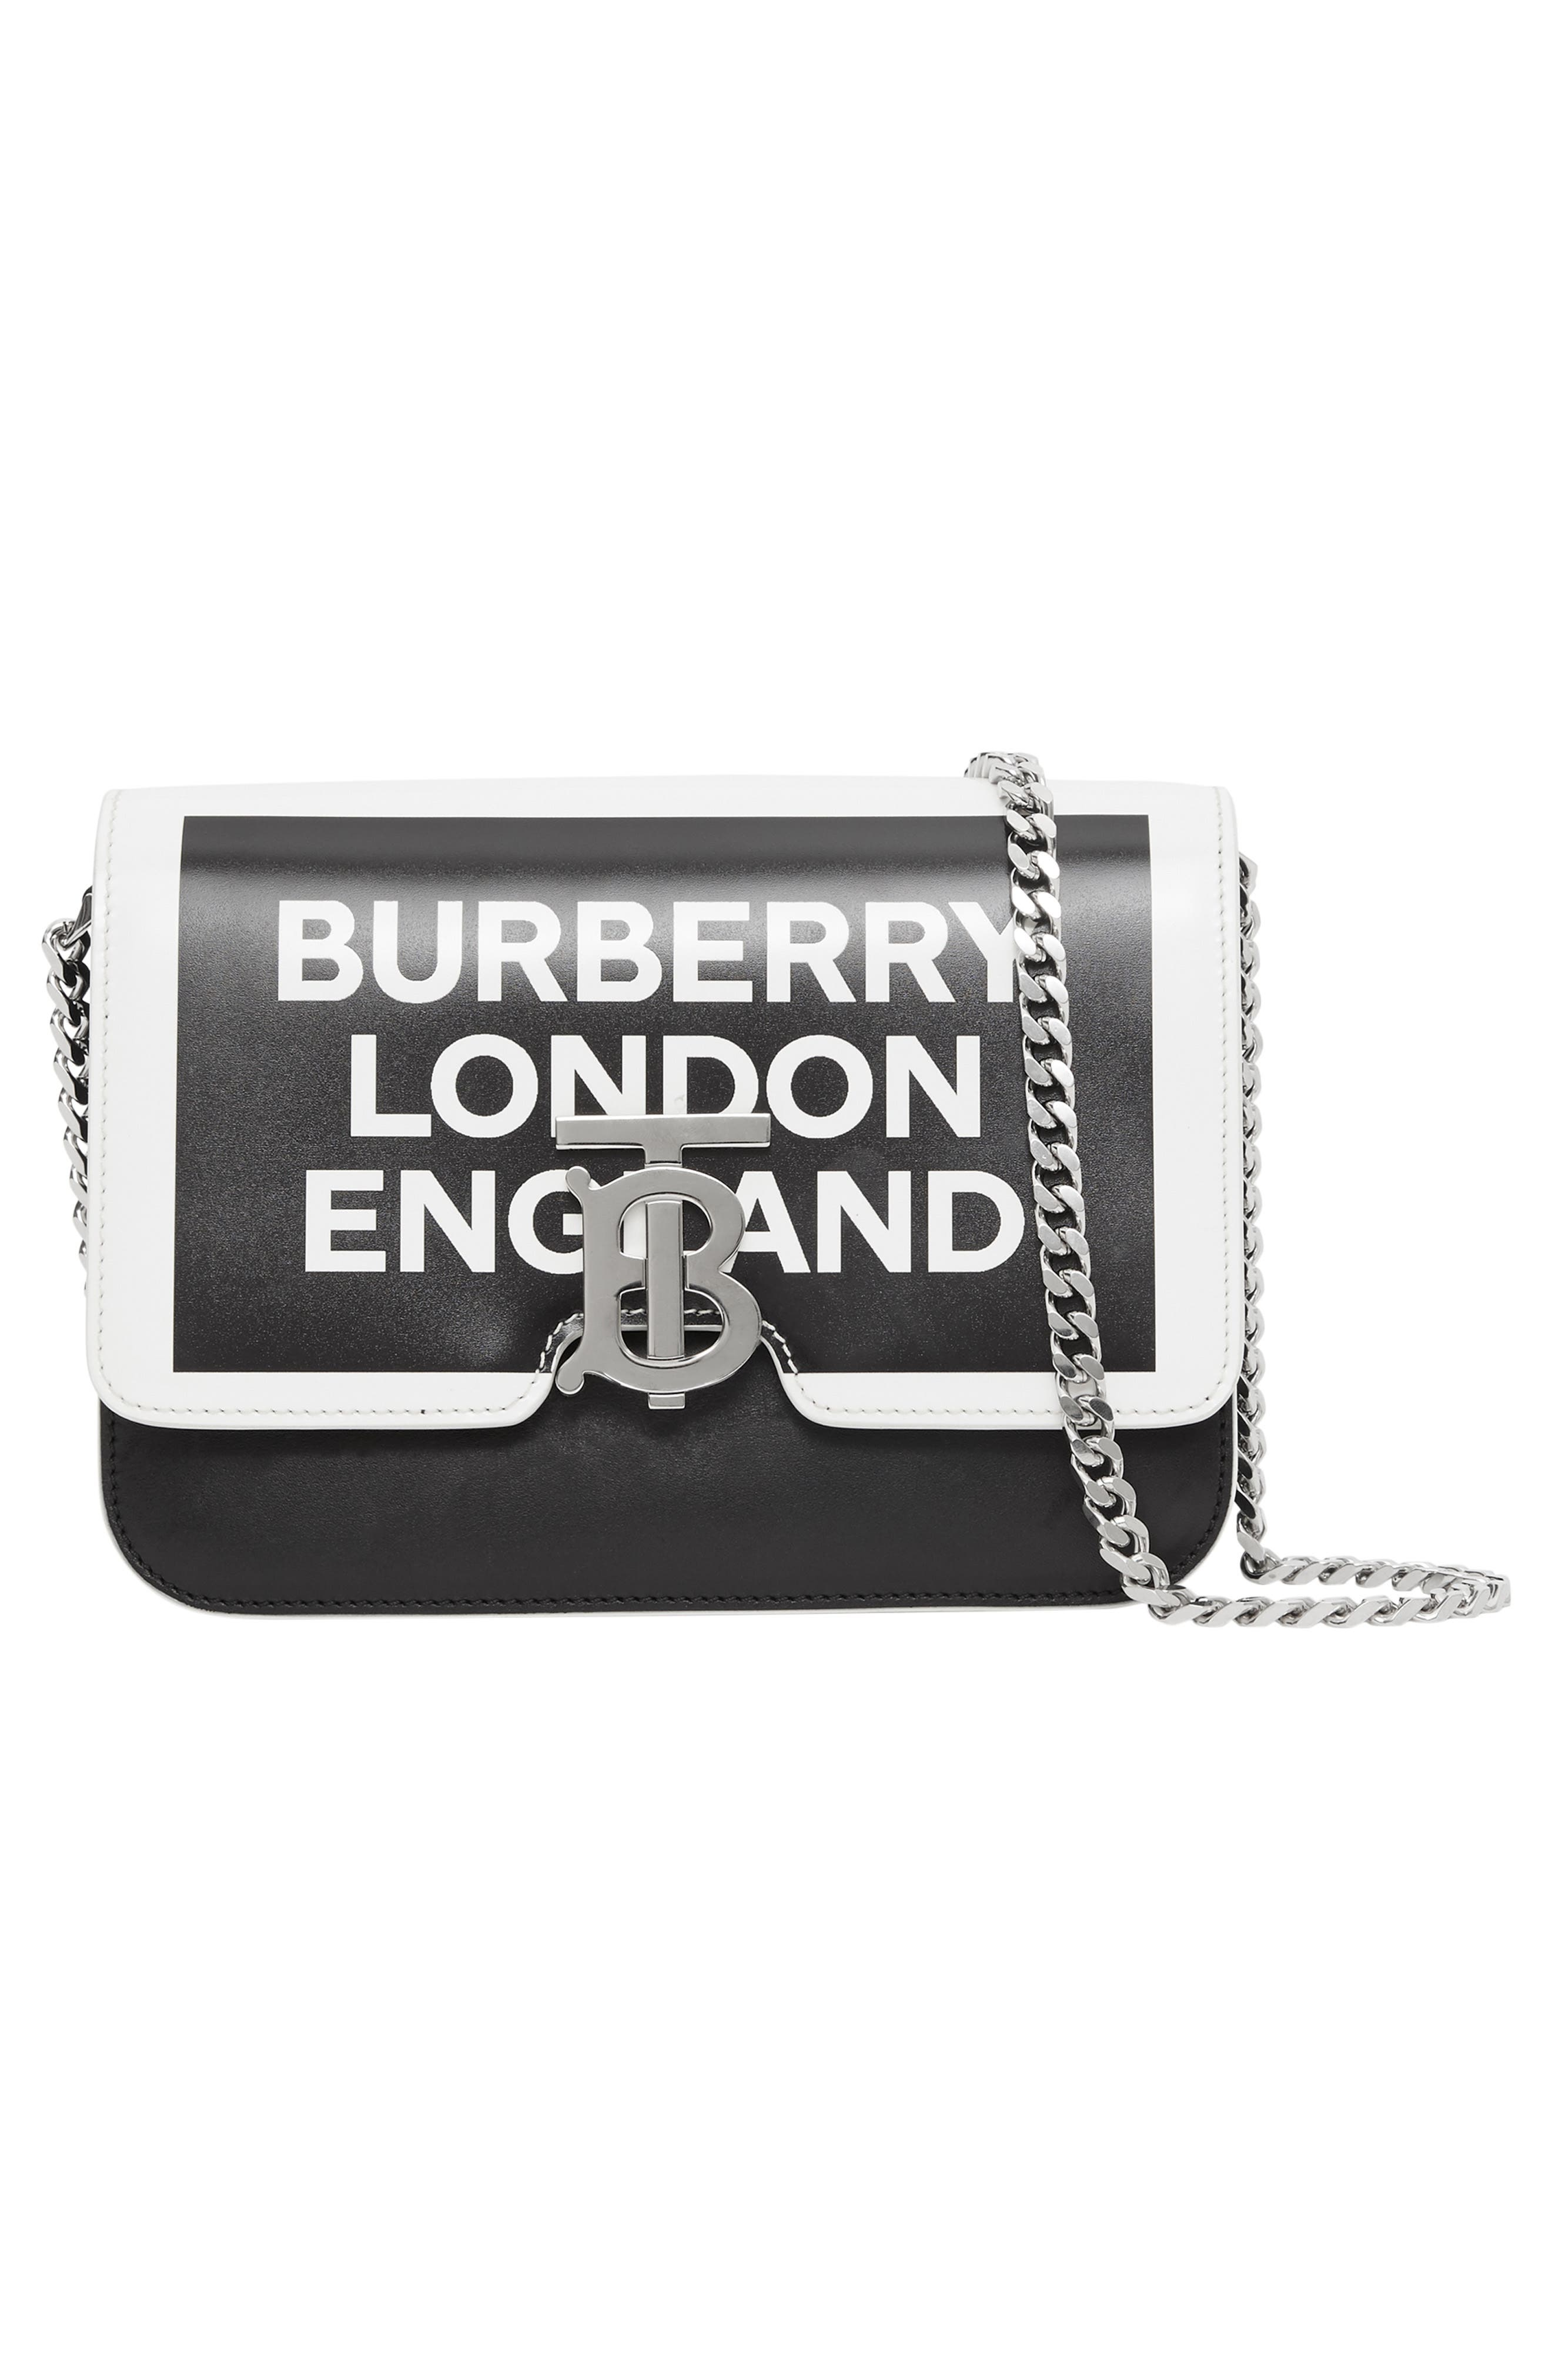 BURBERRY,                             Small Painted Edge Logo TB Crossbody Bag,                             Alternate thumbnail 8, color,                             BLACK/ WHITE